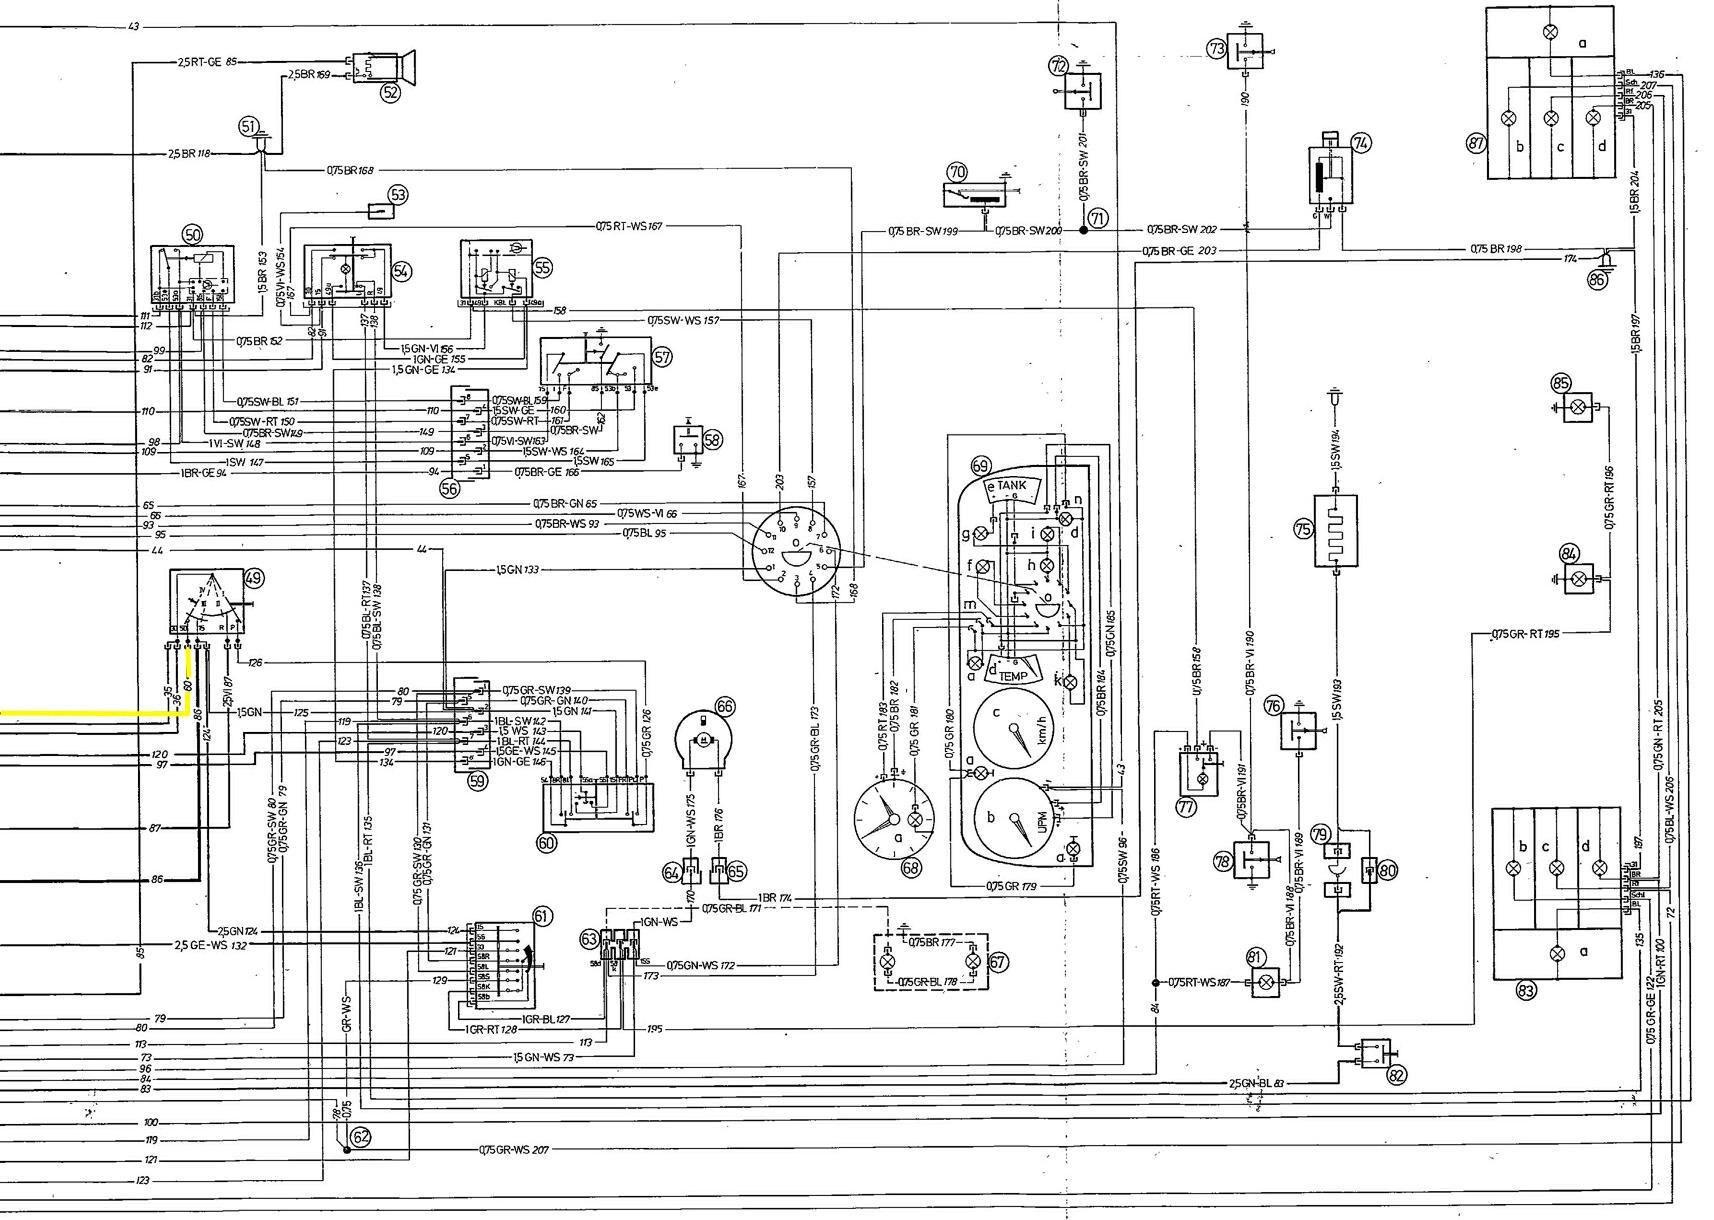 bmw e65 wiring diagram - wiring diagram page mass-freeze -  mass-freeze.faishoppingconsvitol.it  faishoppingconsvitol.it